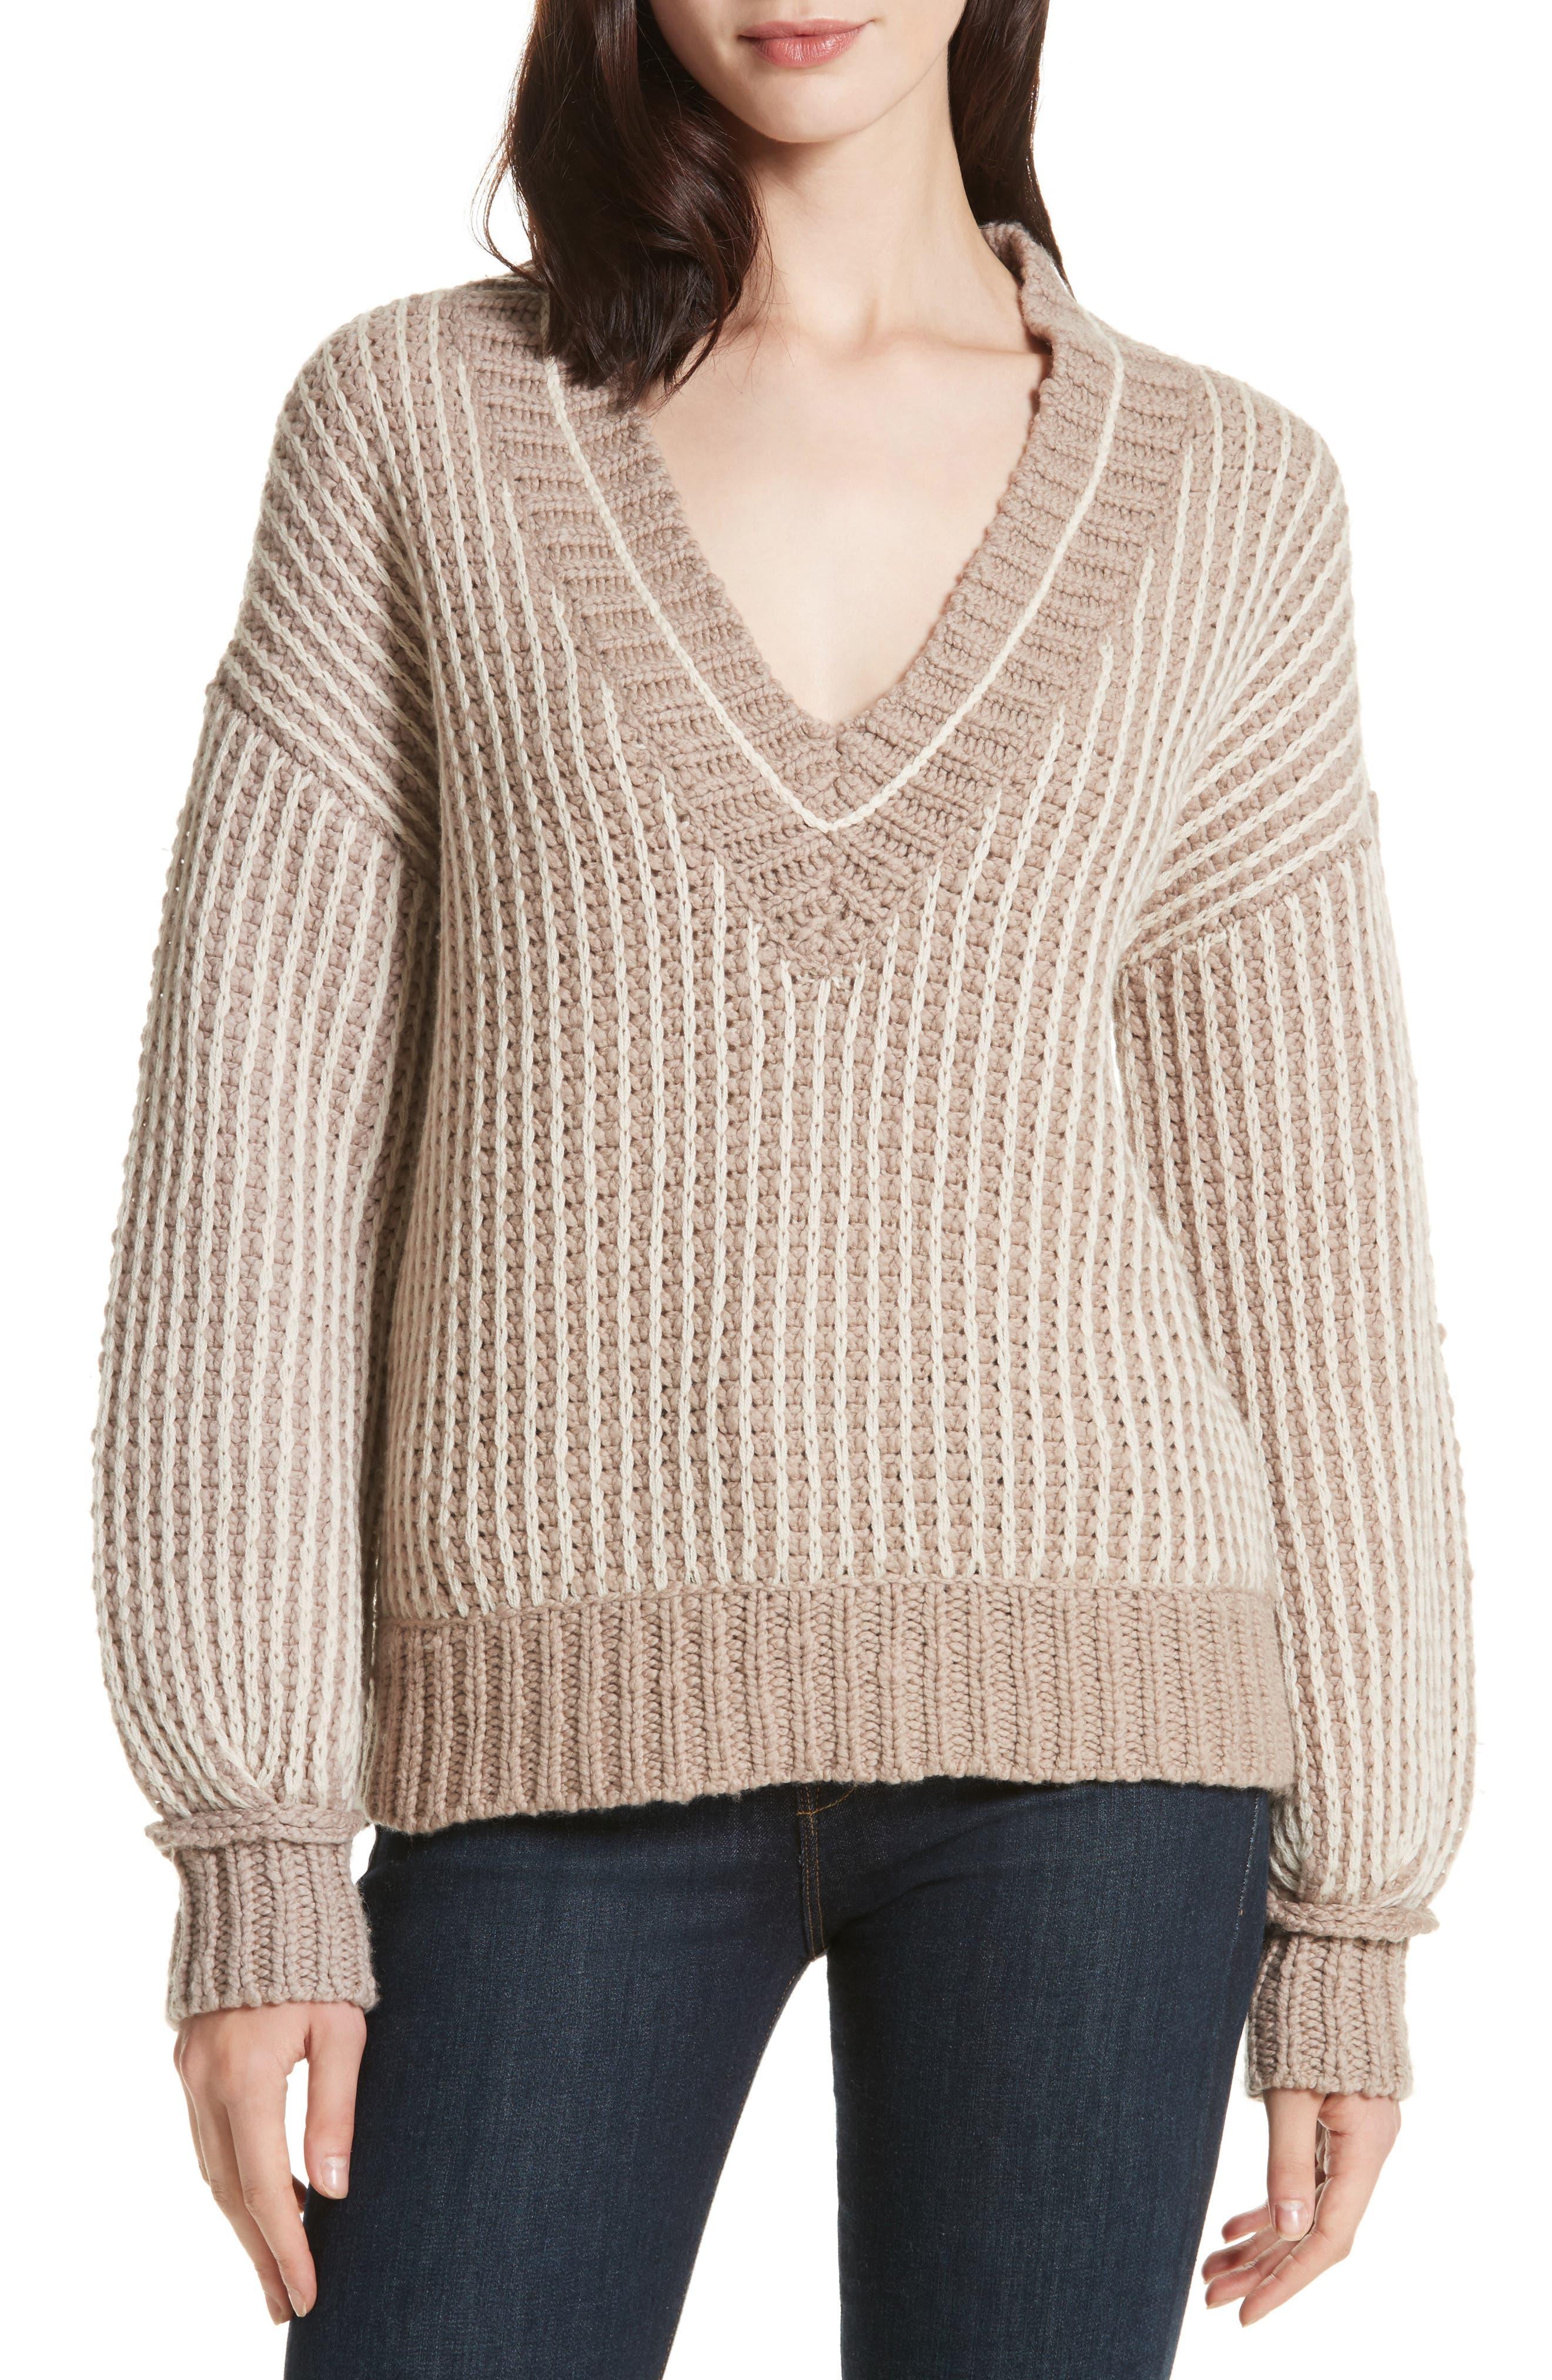 Jessen Stripe Wool & Cashmere Sweater,                             Main thumbnail 1, color,                             210